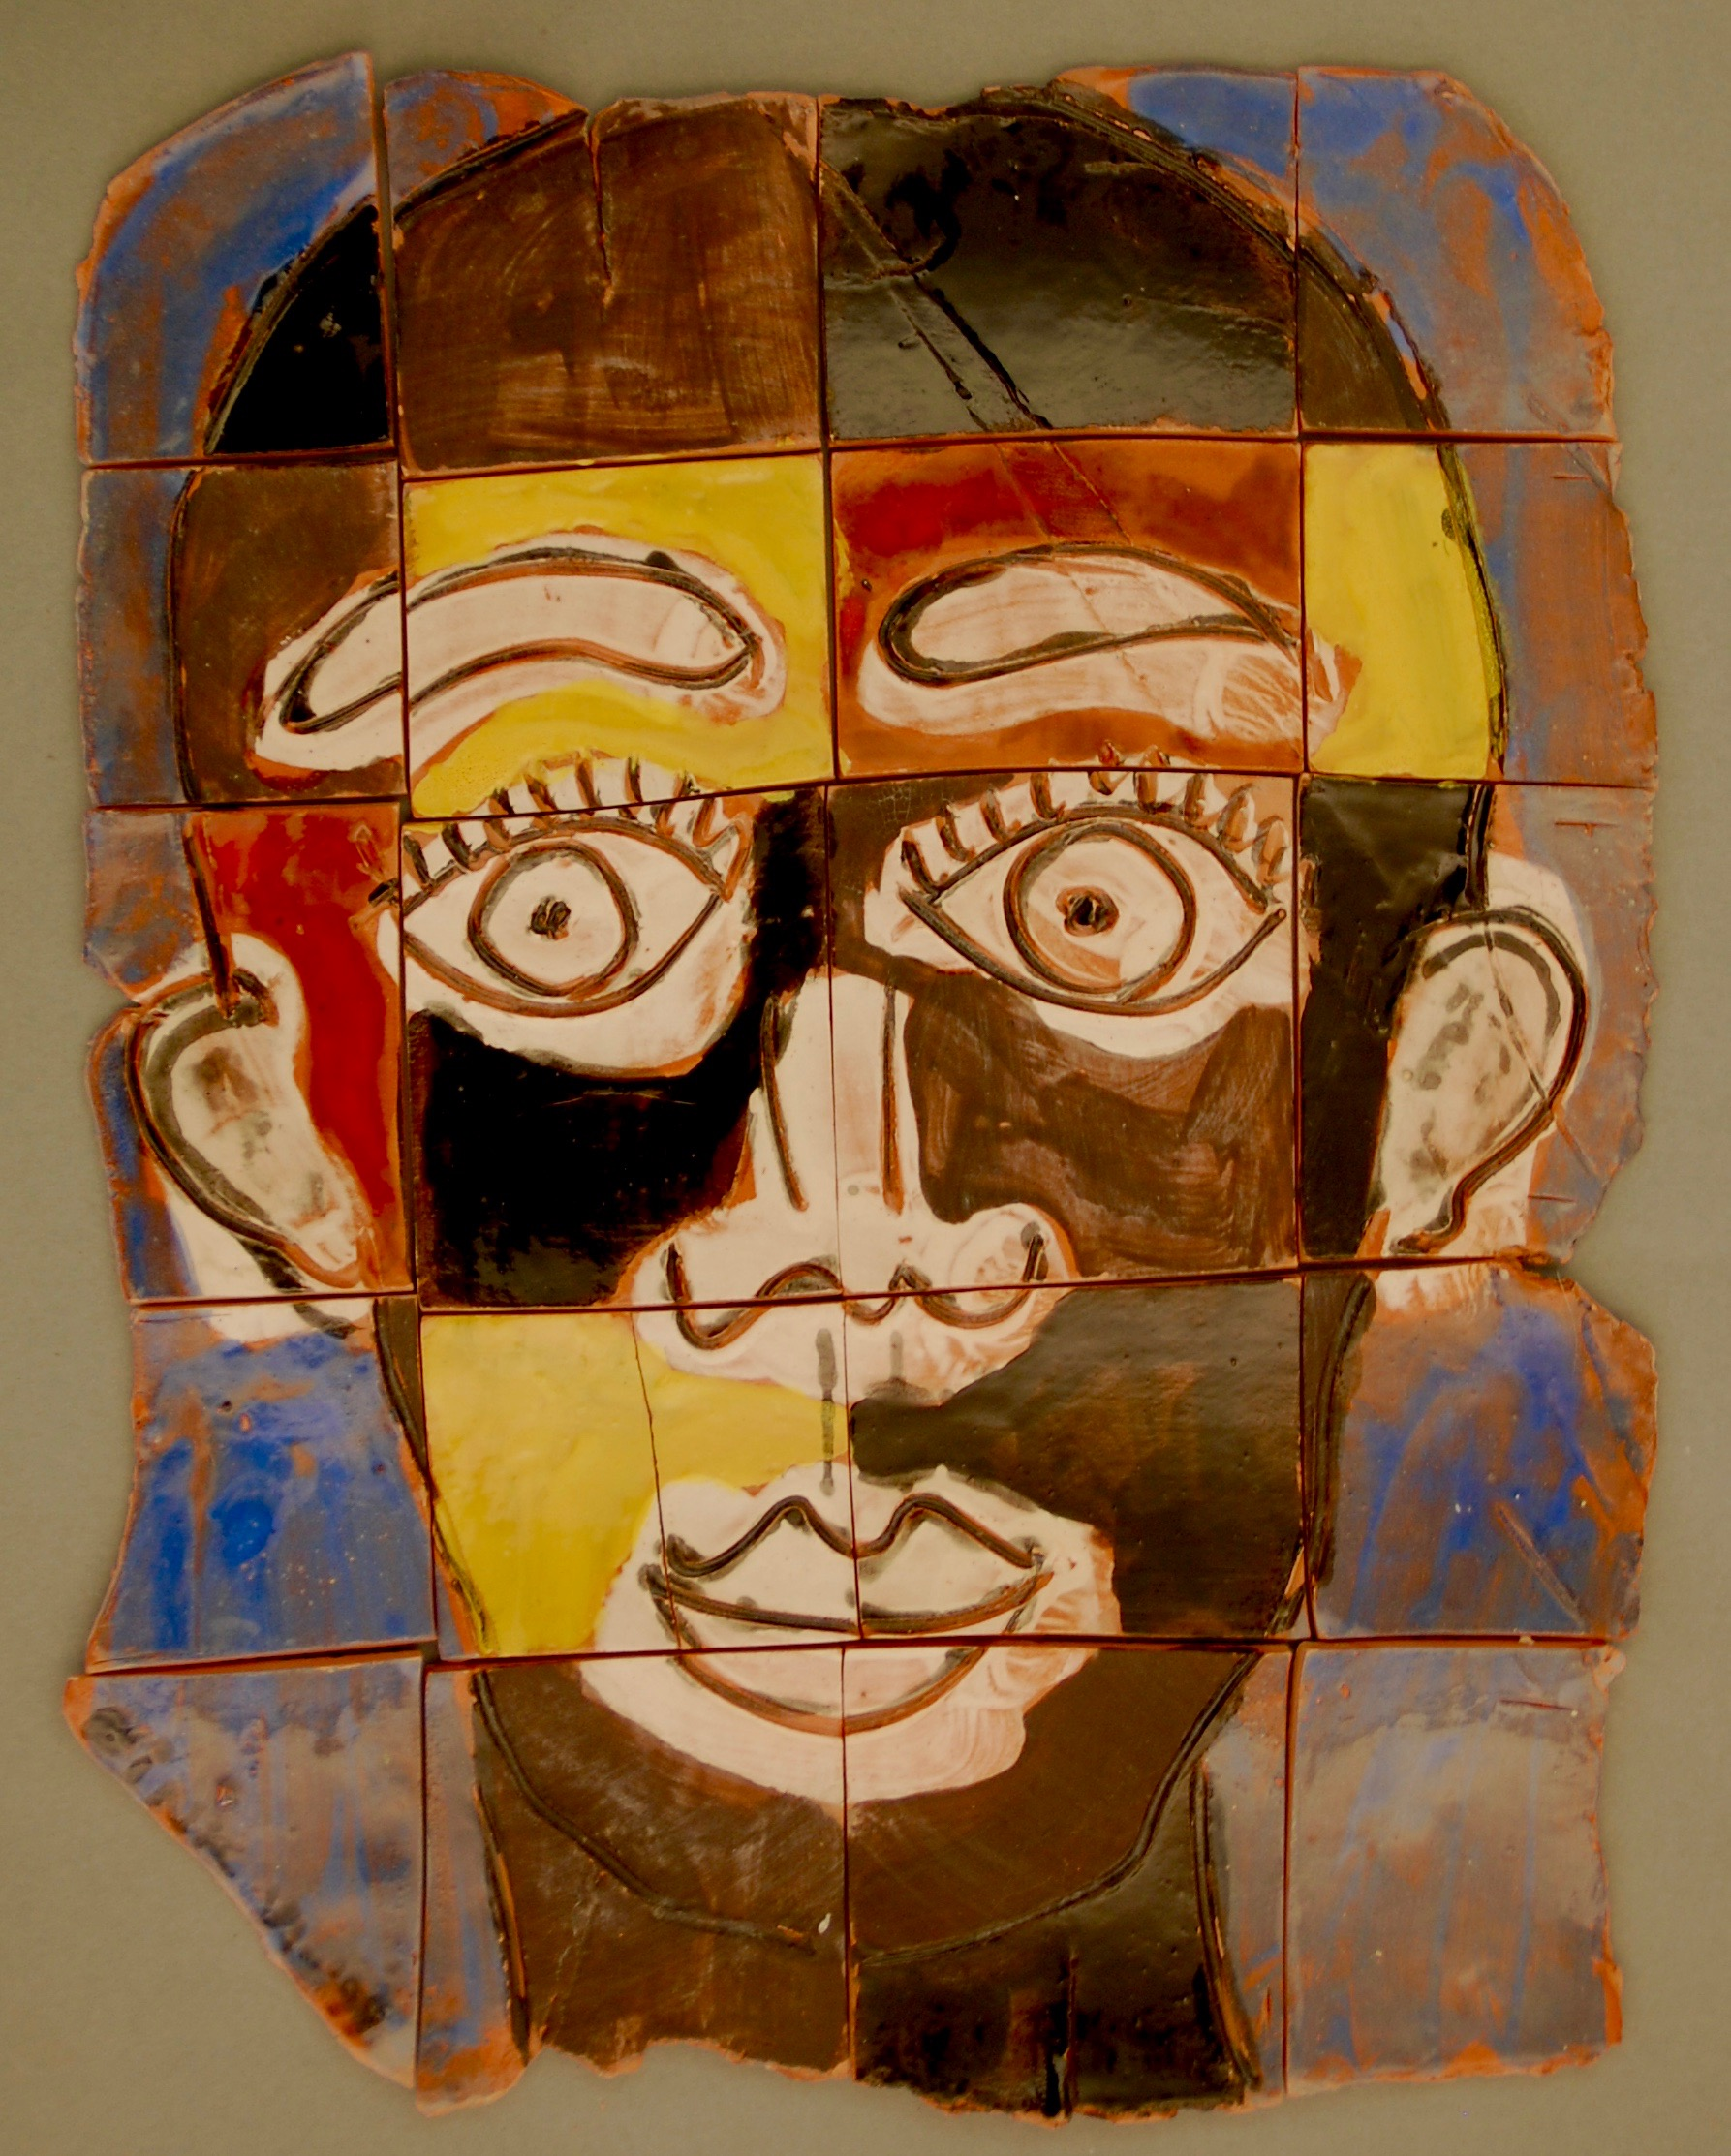 Head of a man terra cotta puzzle, 1999